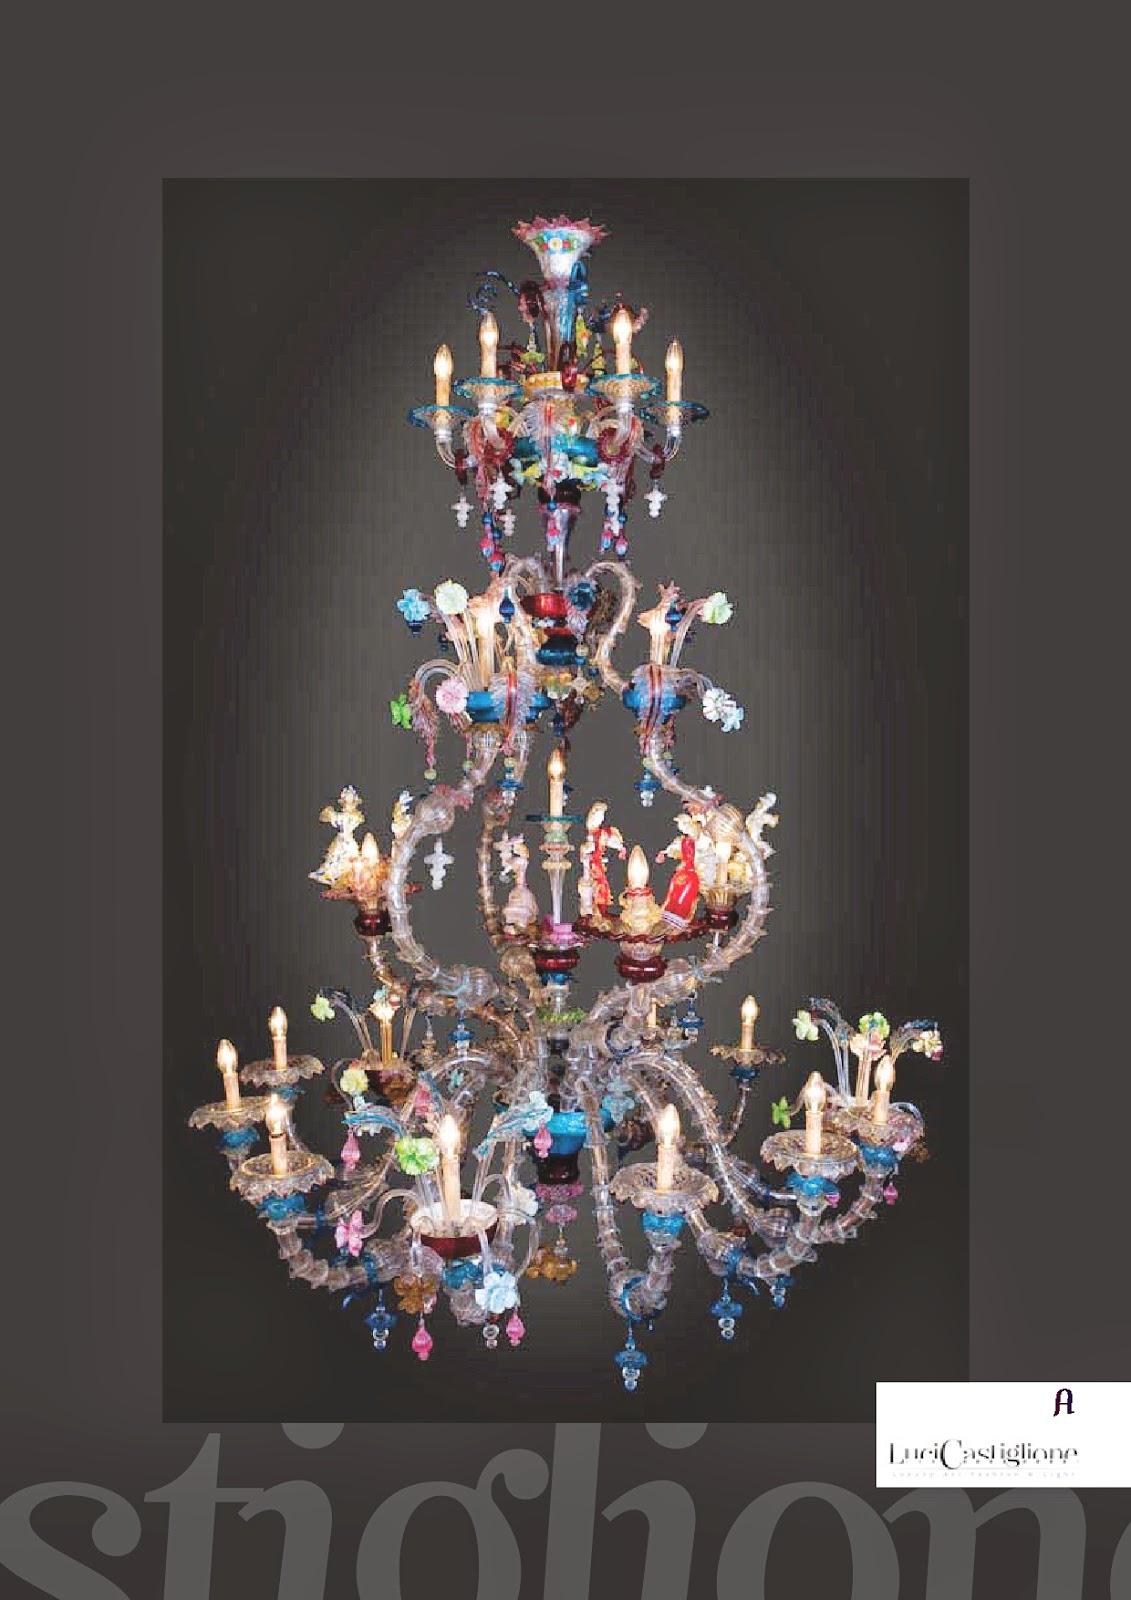 Lucicastiglione fabbrica lampadari: Lampadari di grandi dimensioni